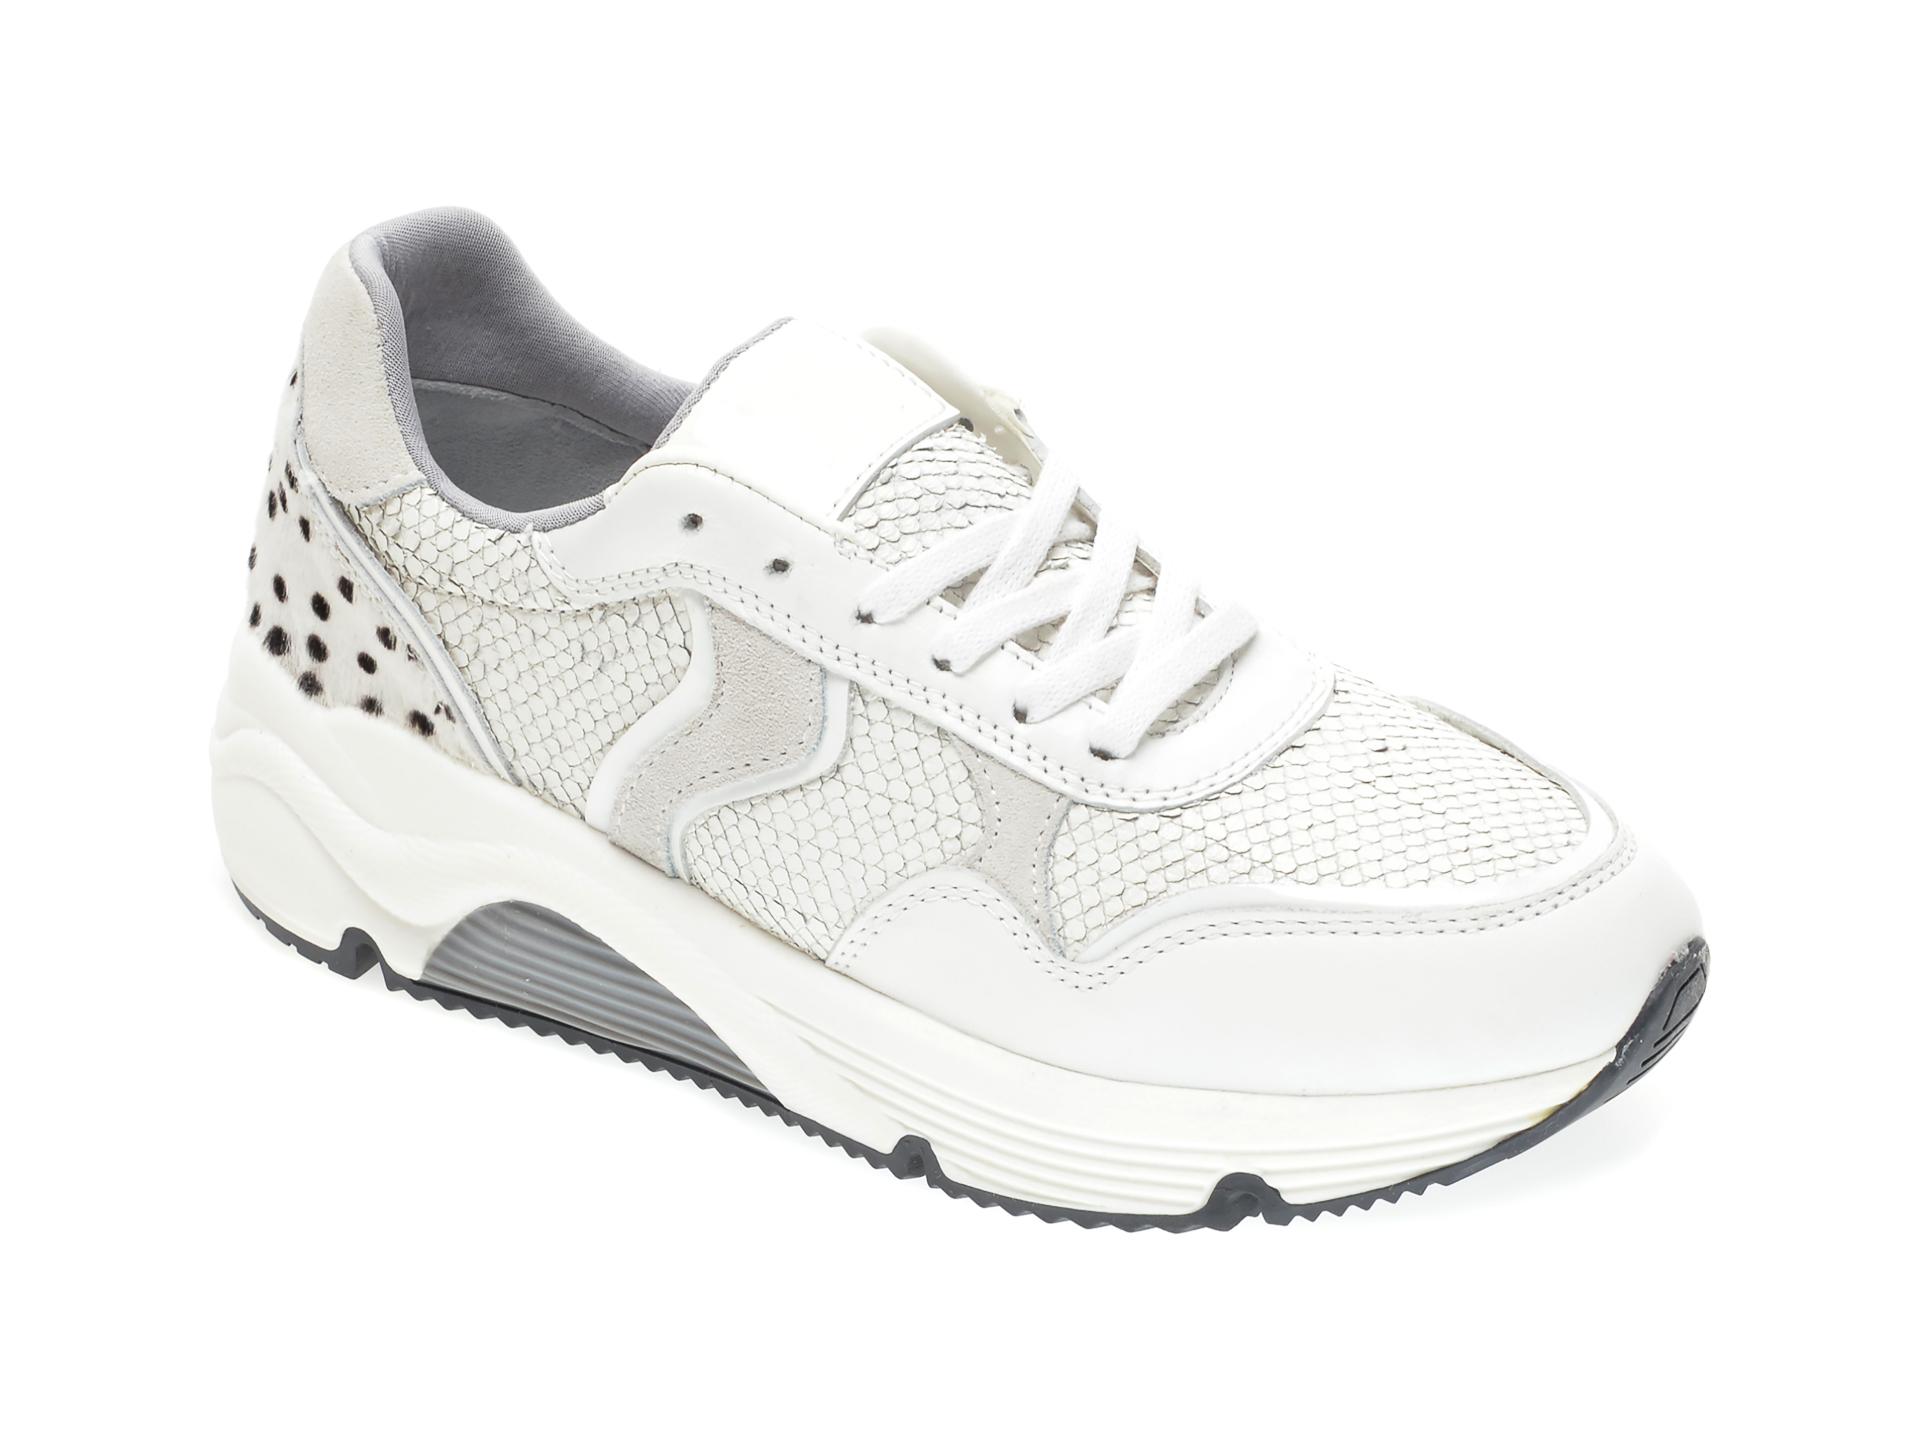 Pantofi sport RADIKAL albi, 2911, din piele naturala imagine